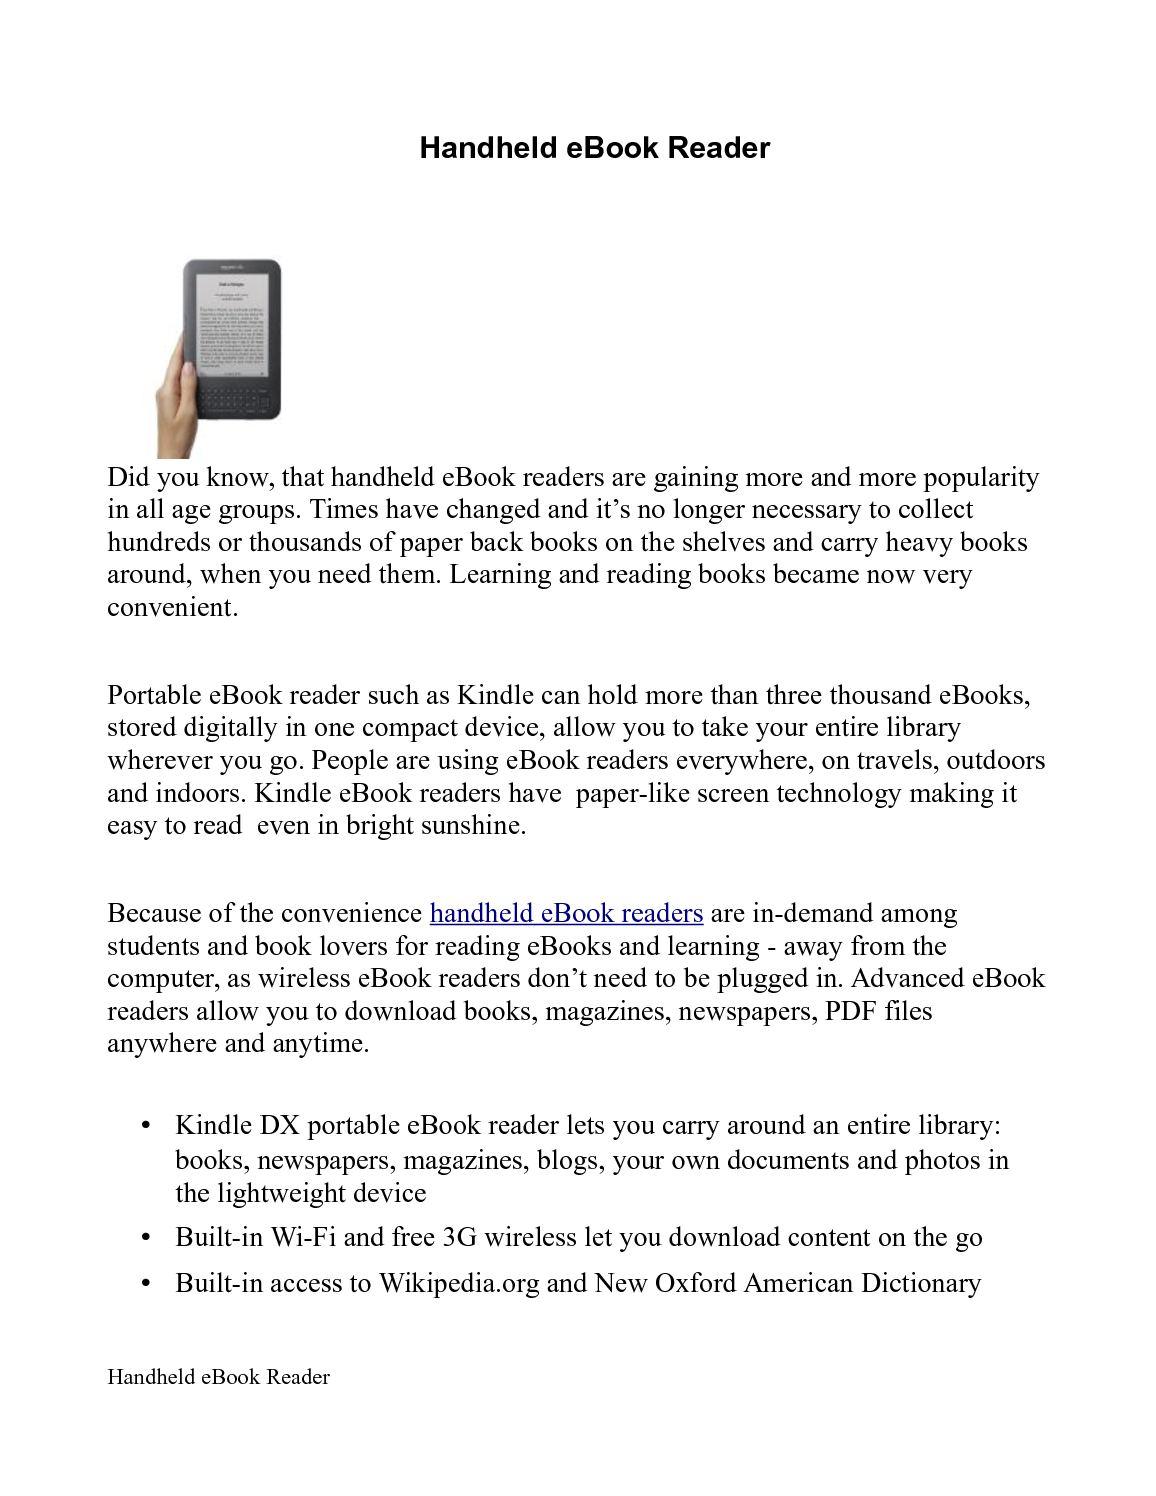 Calaméo - Handheld eBook Reader